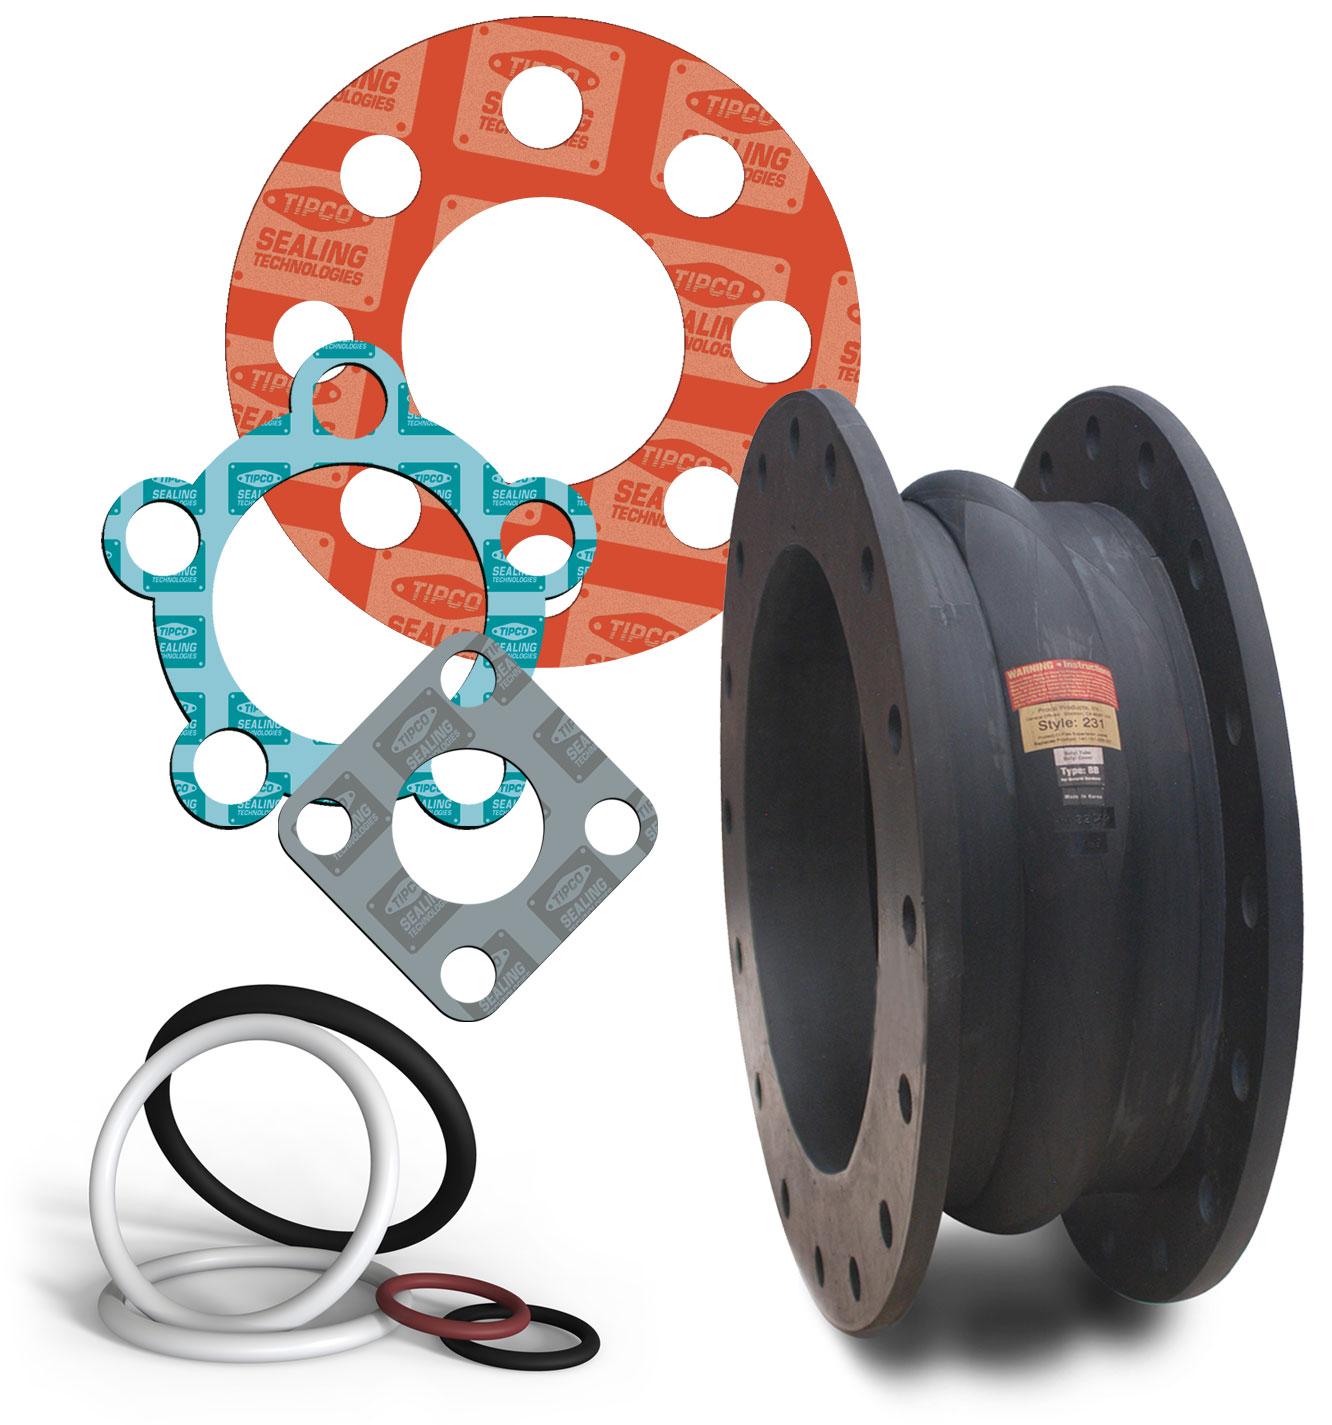 TIPCO Sealing Technologies